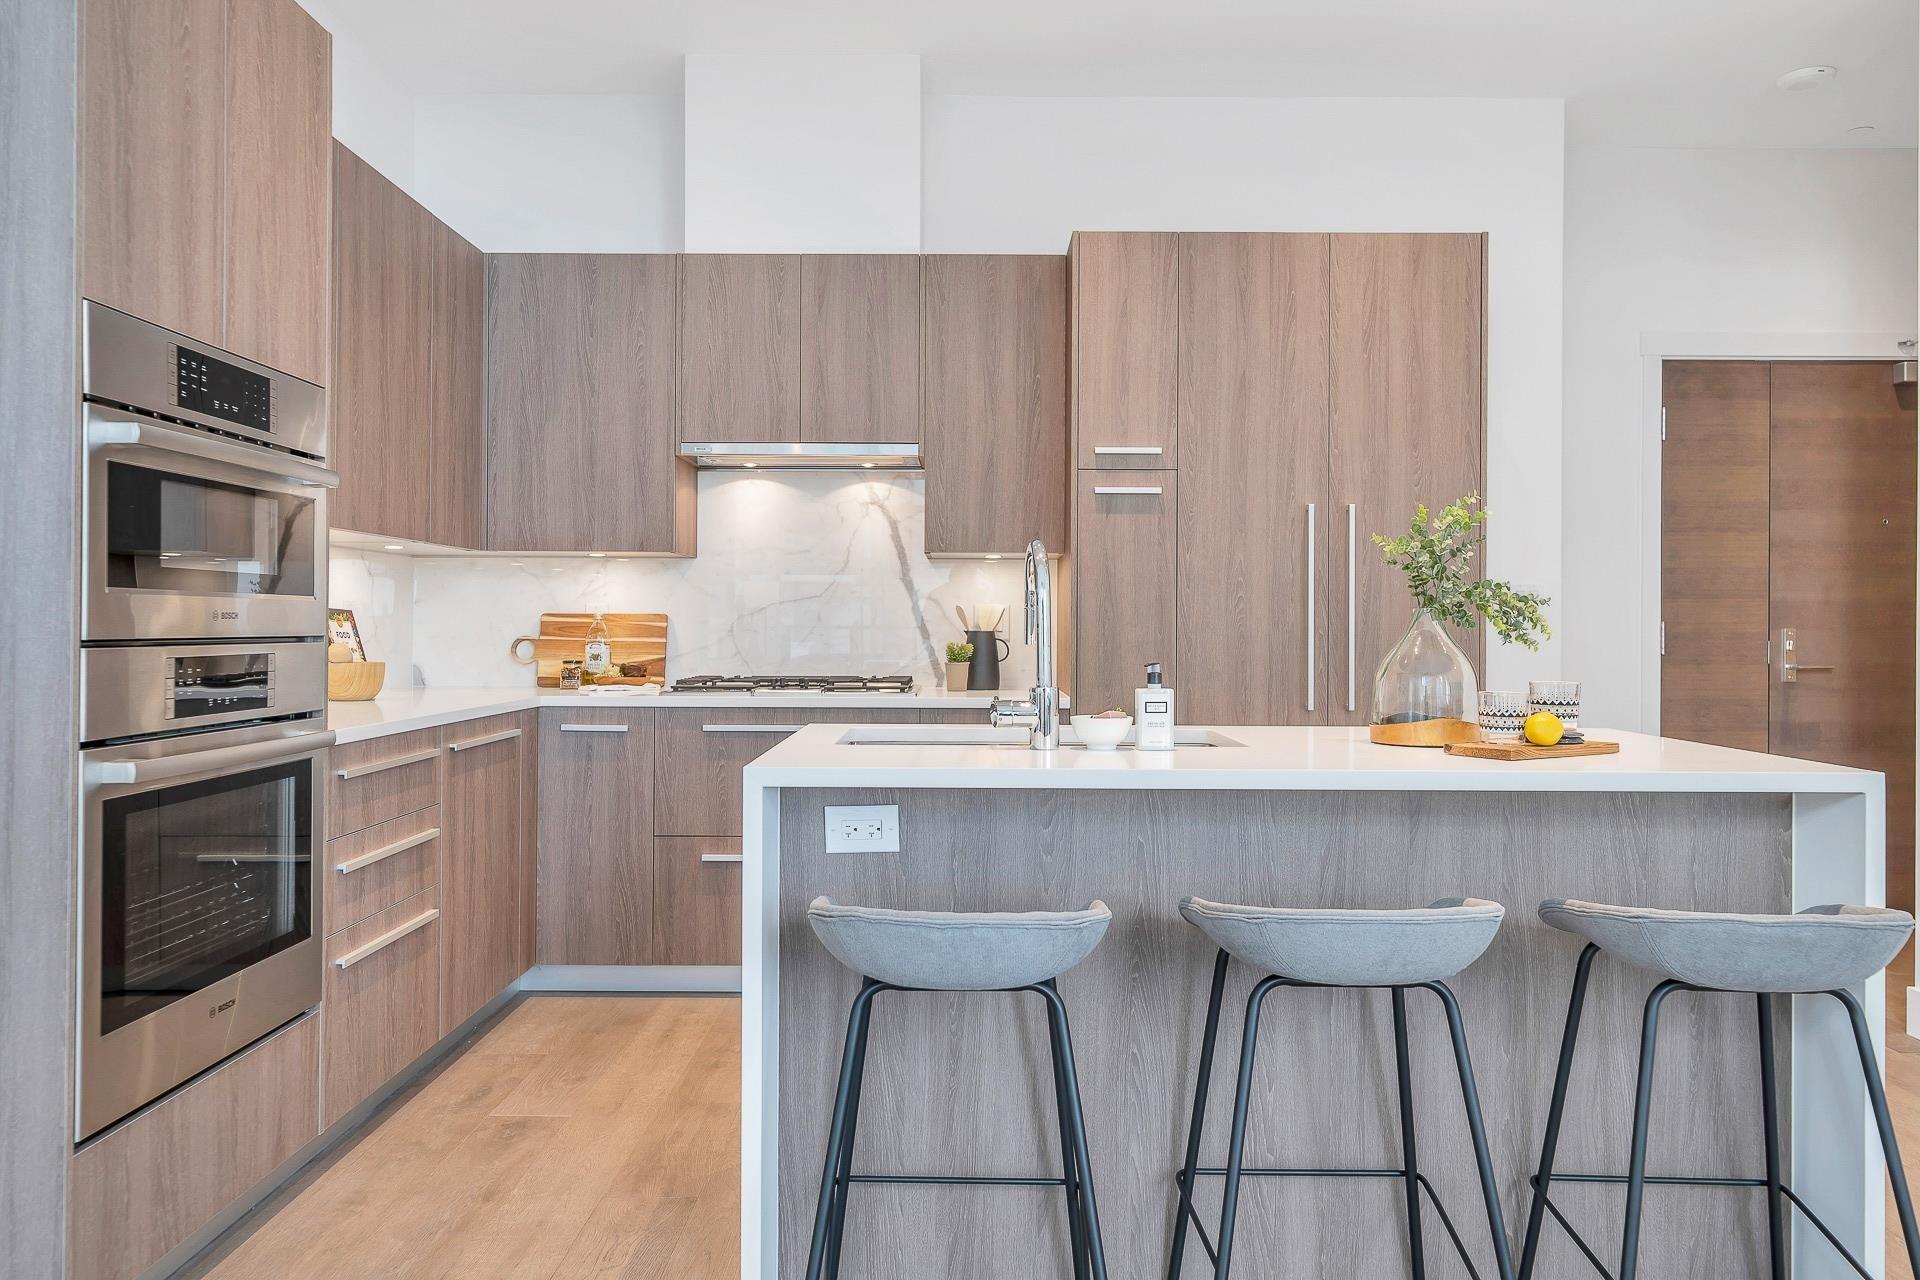 702 2780 VALLEY CENTRE AVENUE - Lynn Valley Apartment/Condo for sale, 3 Bedrooms (R2622279) - #9